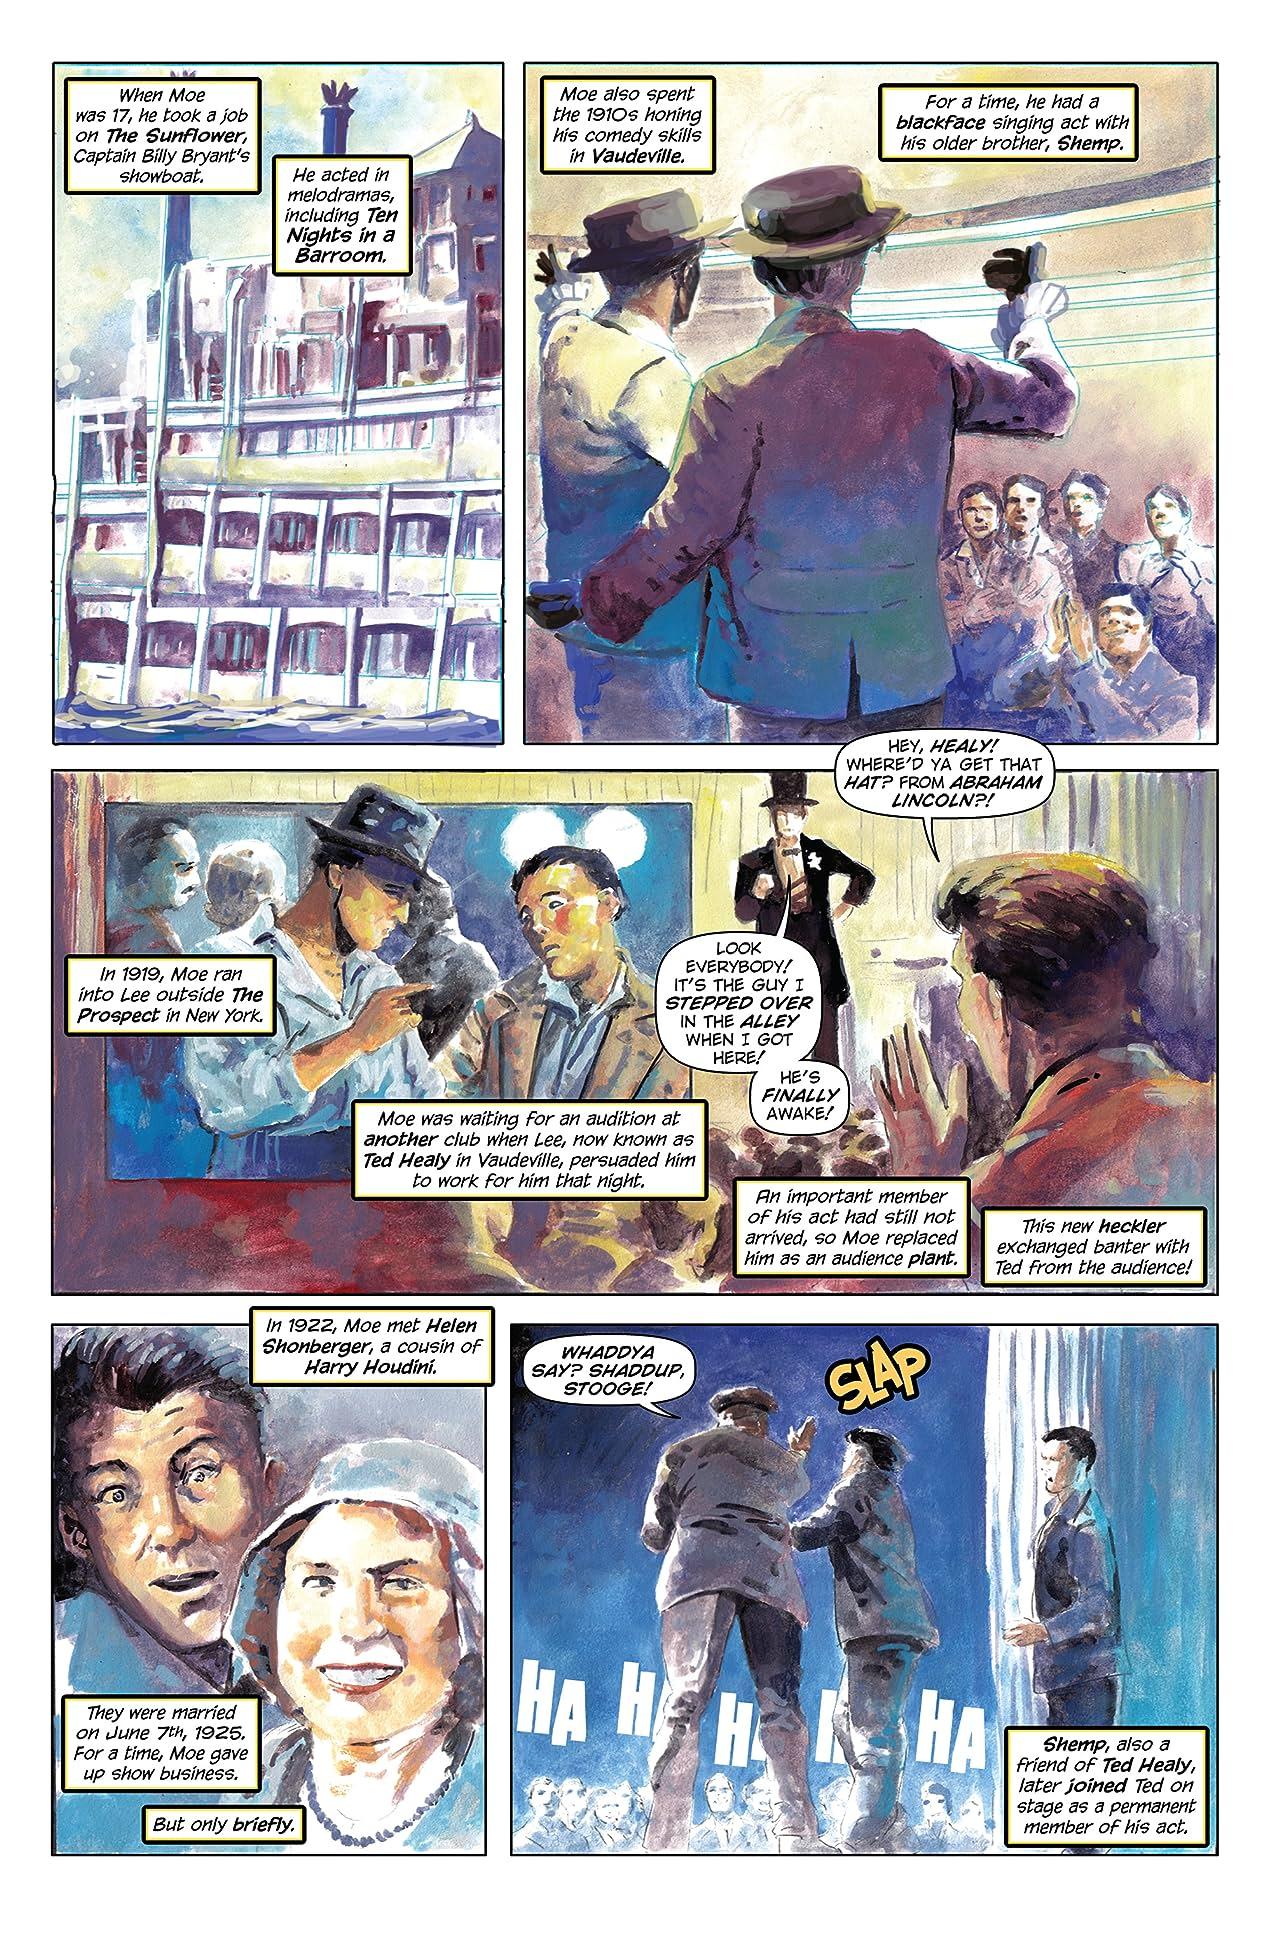 Comics #3: The Three Stooges